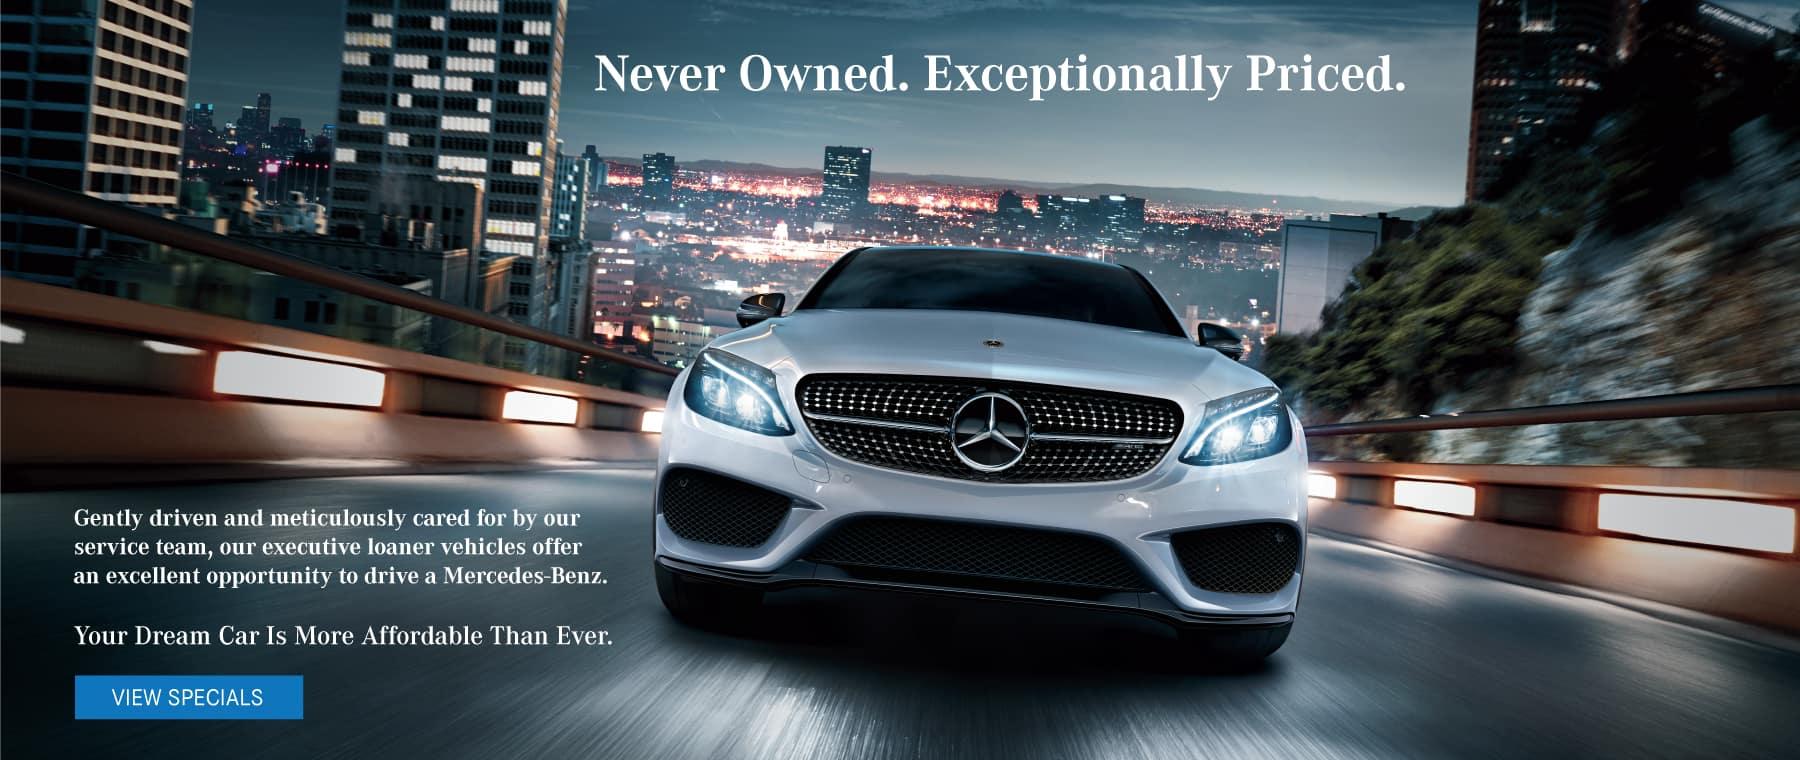 New & Used Luxury Auto Dealership in Warwick | Mercedes-Benz of Warwick